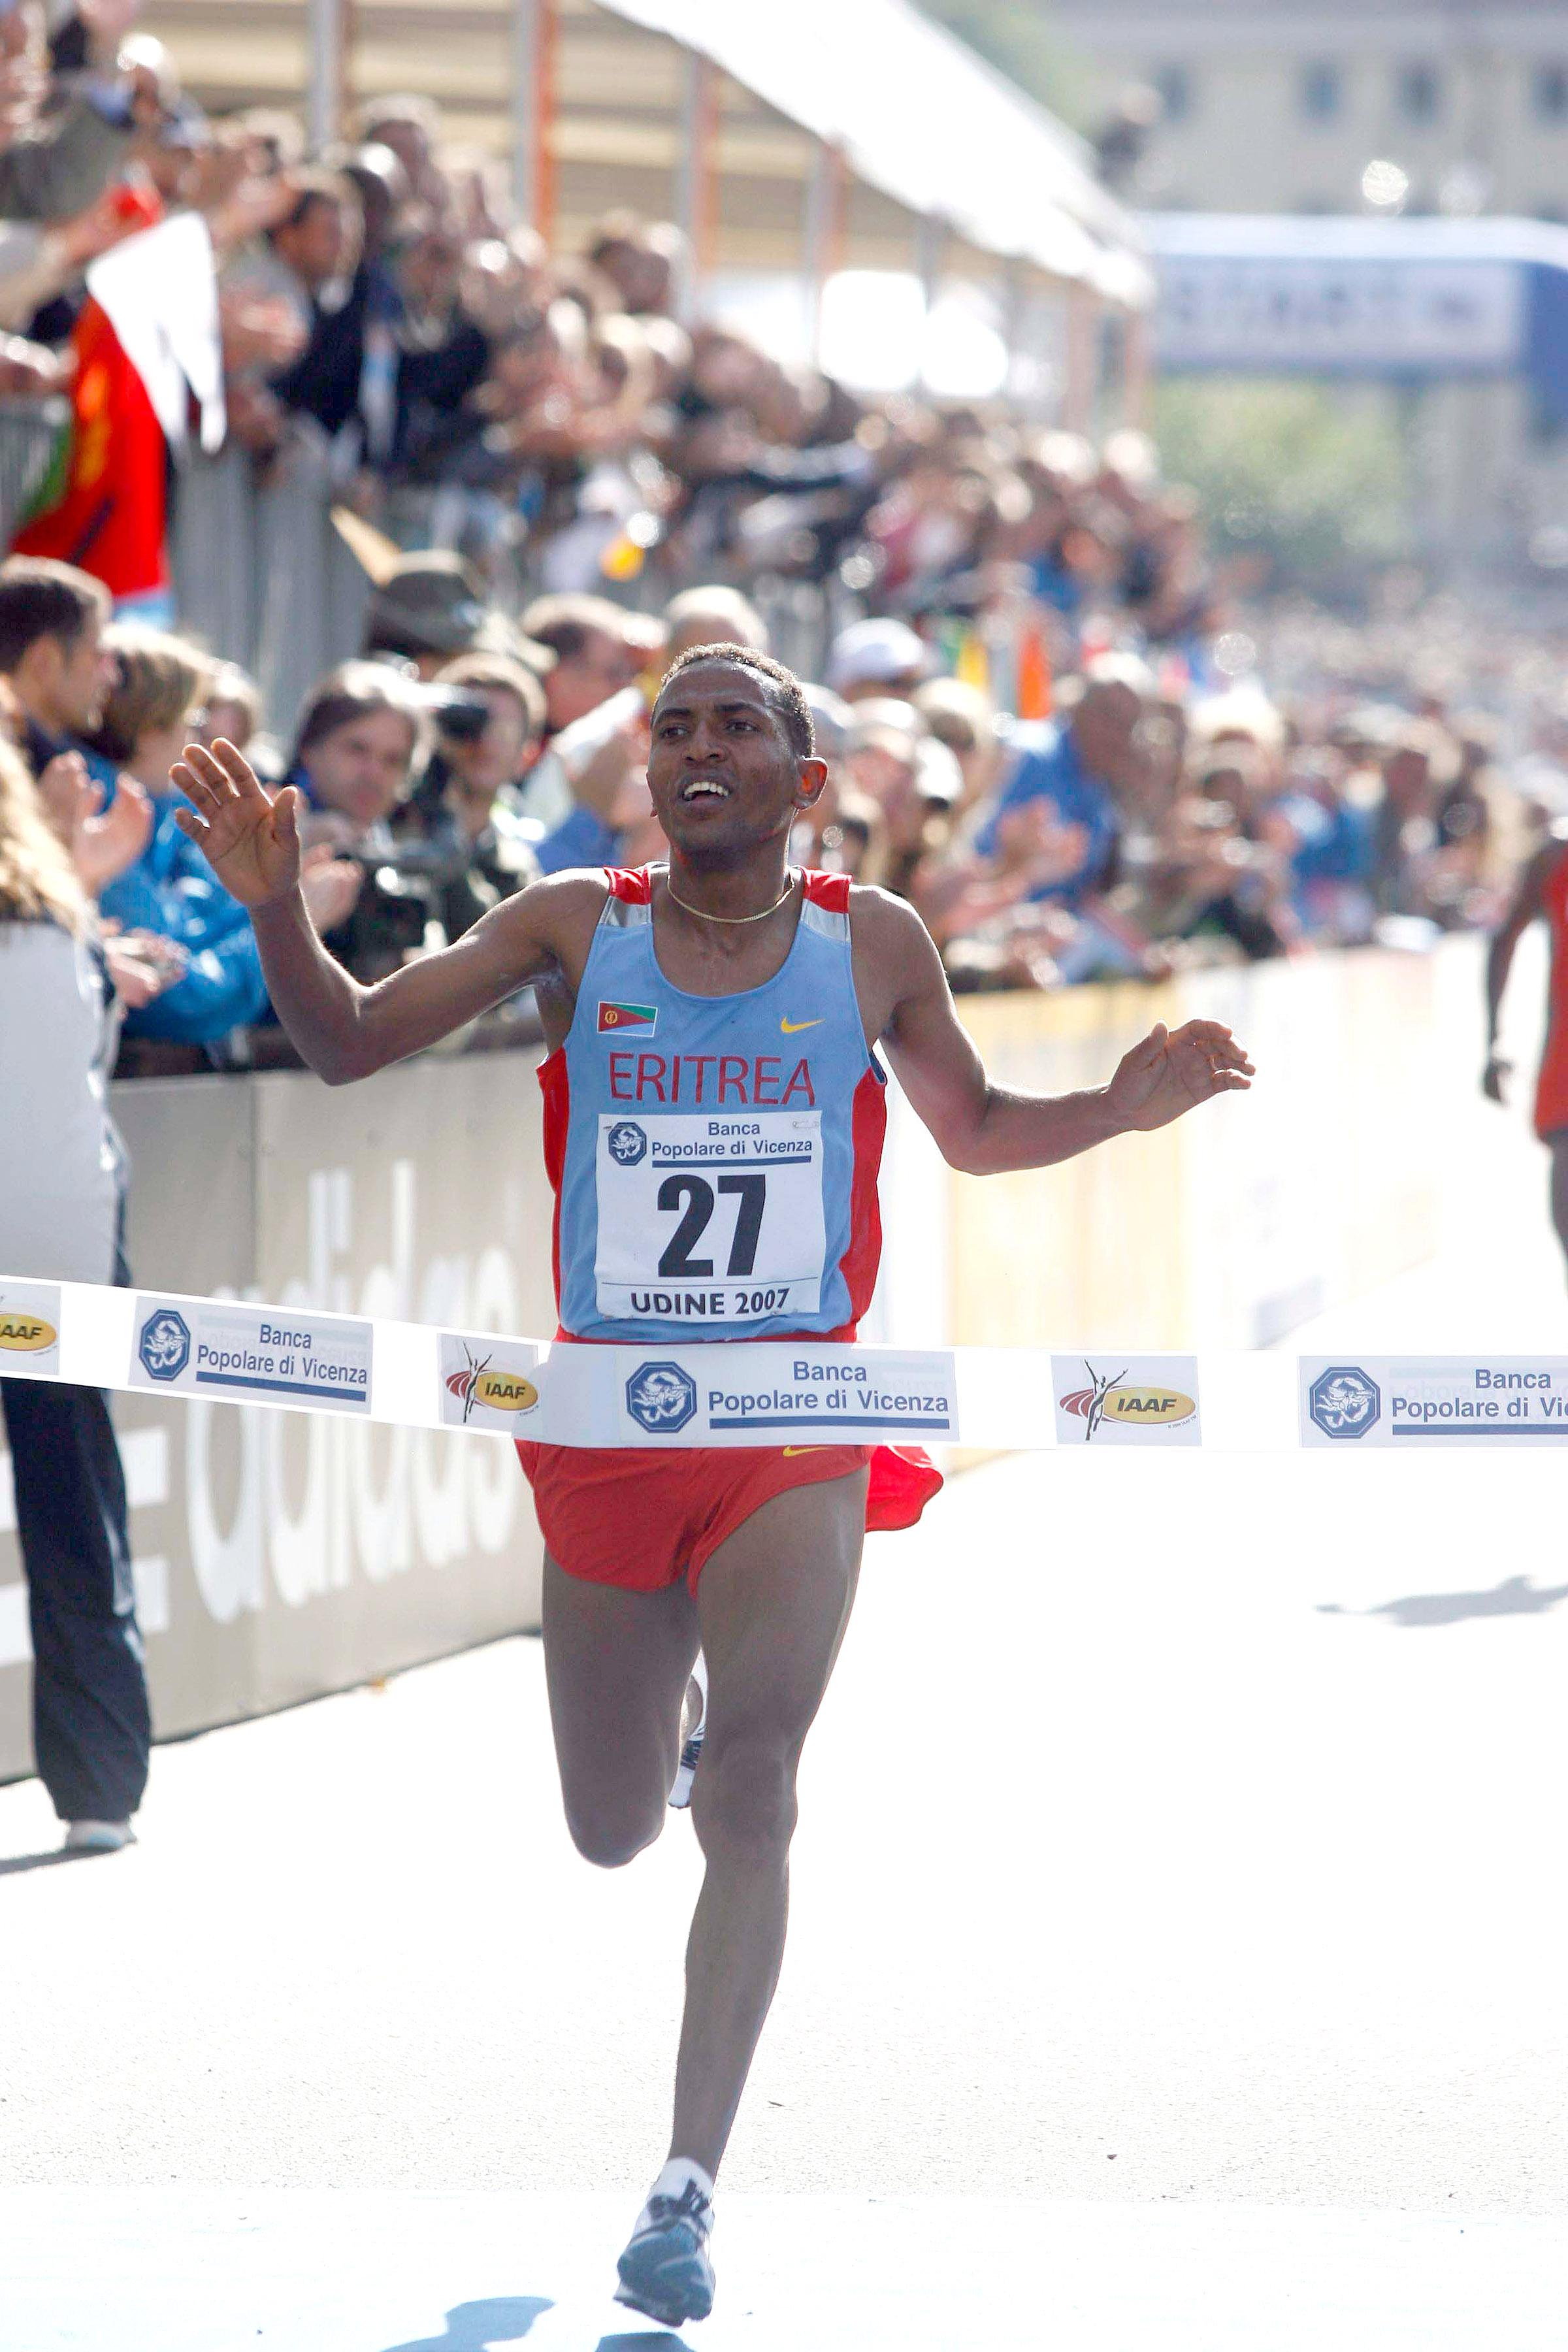 Zersenay Tadese, seen here at the 2007 World Half Marathon Championships, won by a big margin in Lisbon. ©www.photorun.net